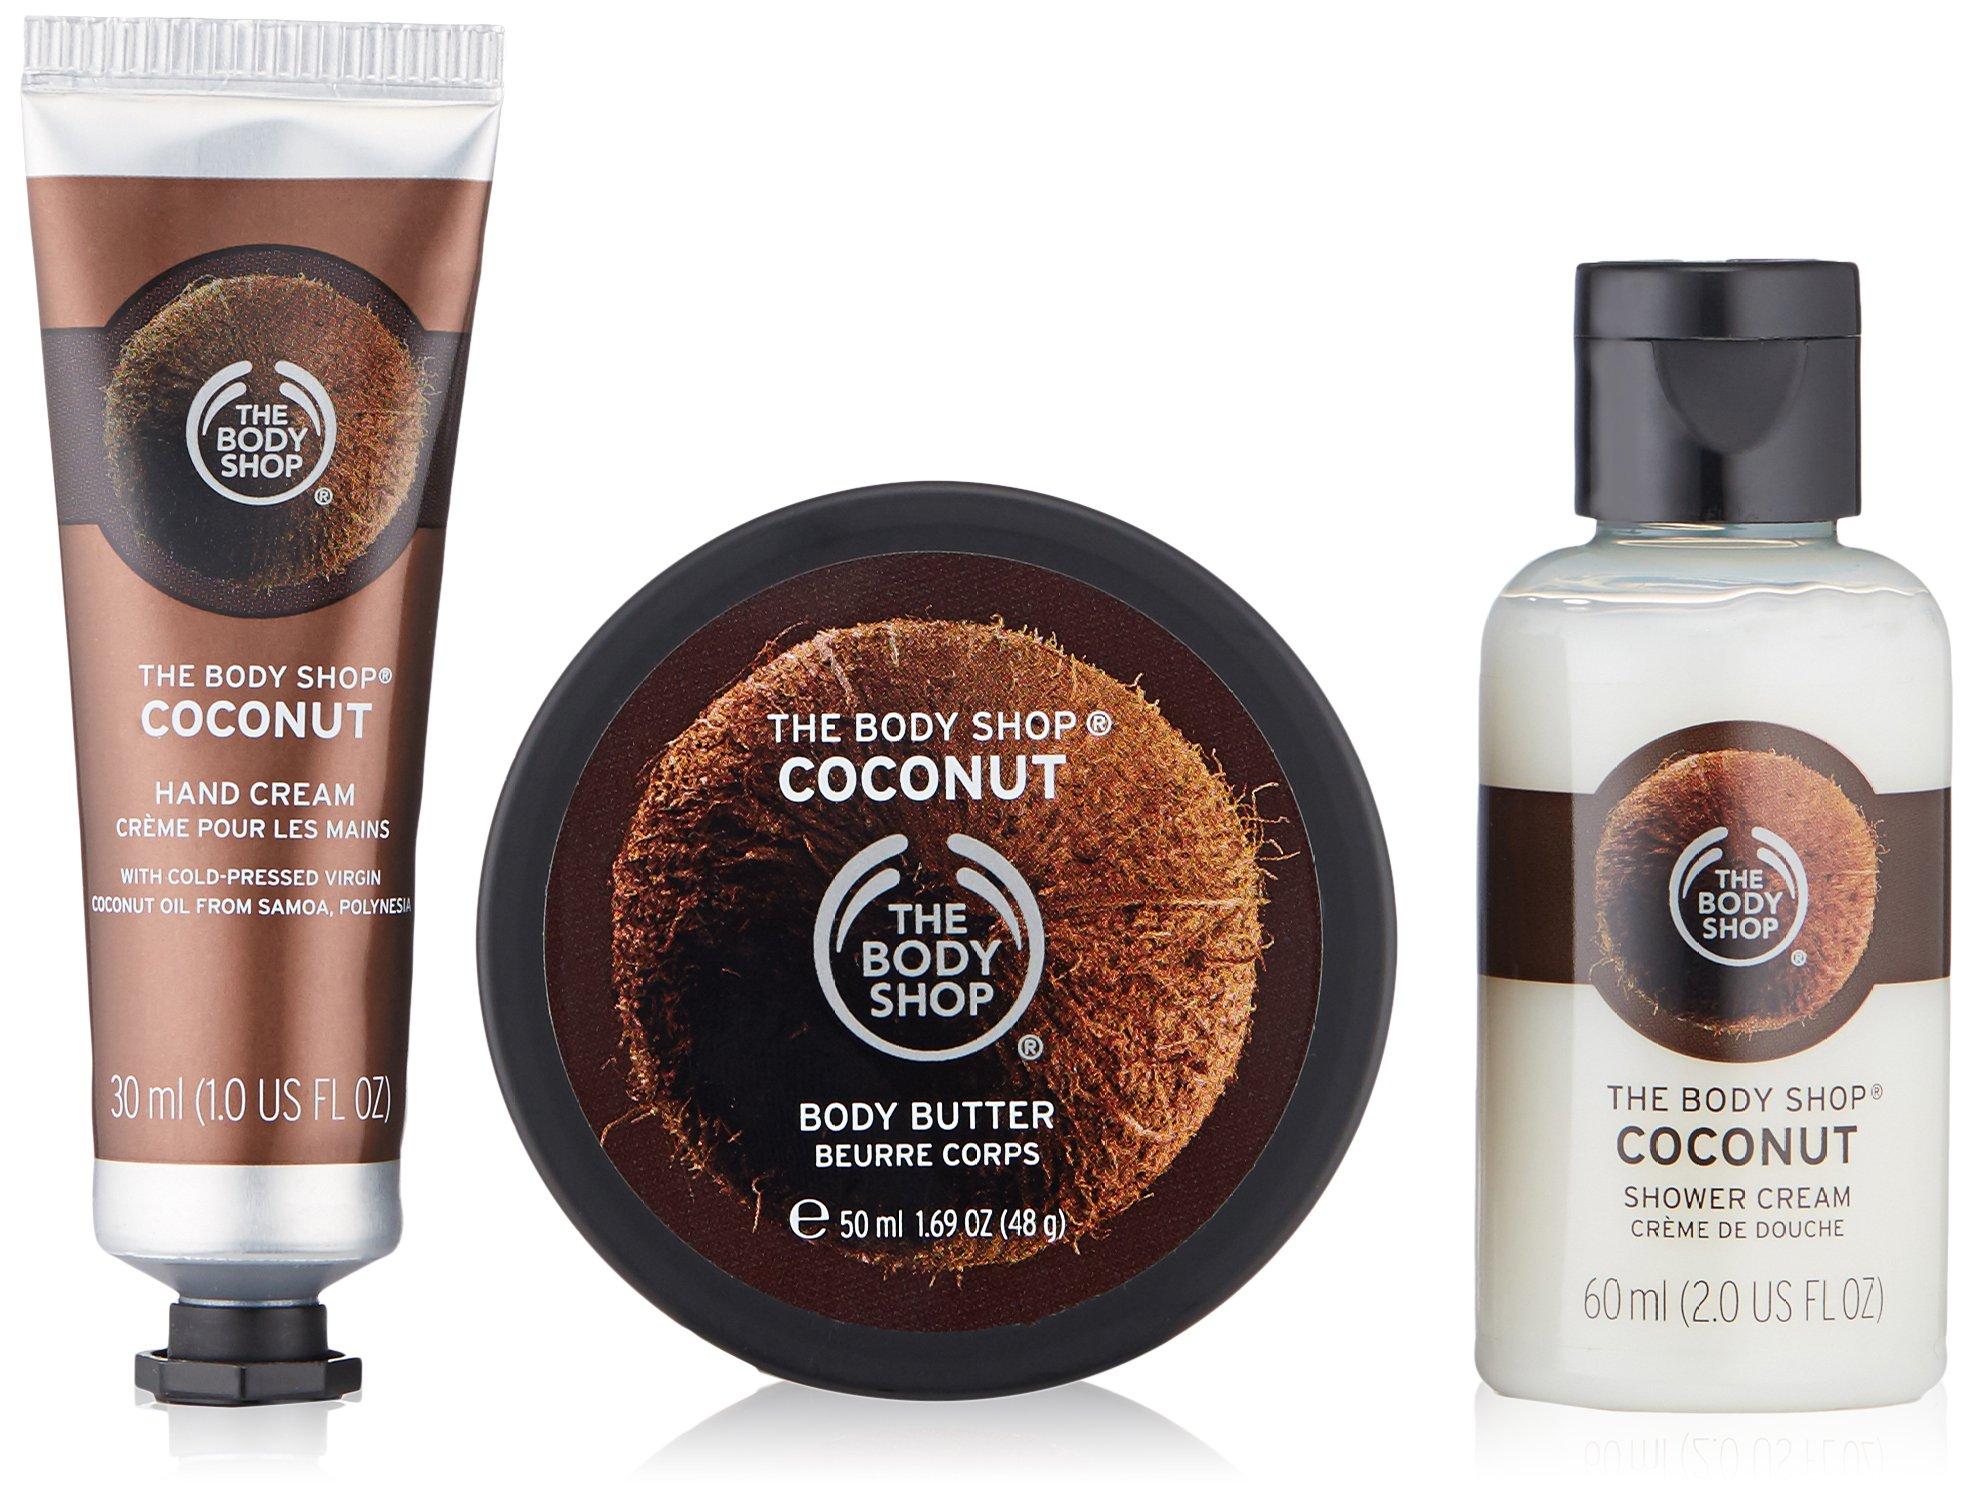 The Body Shop Coconut Beauty Bag